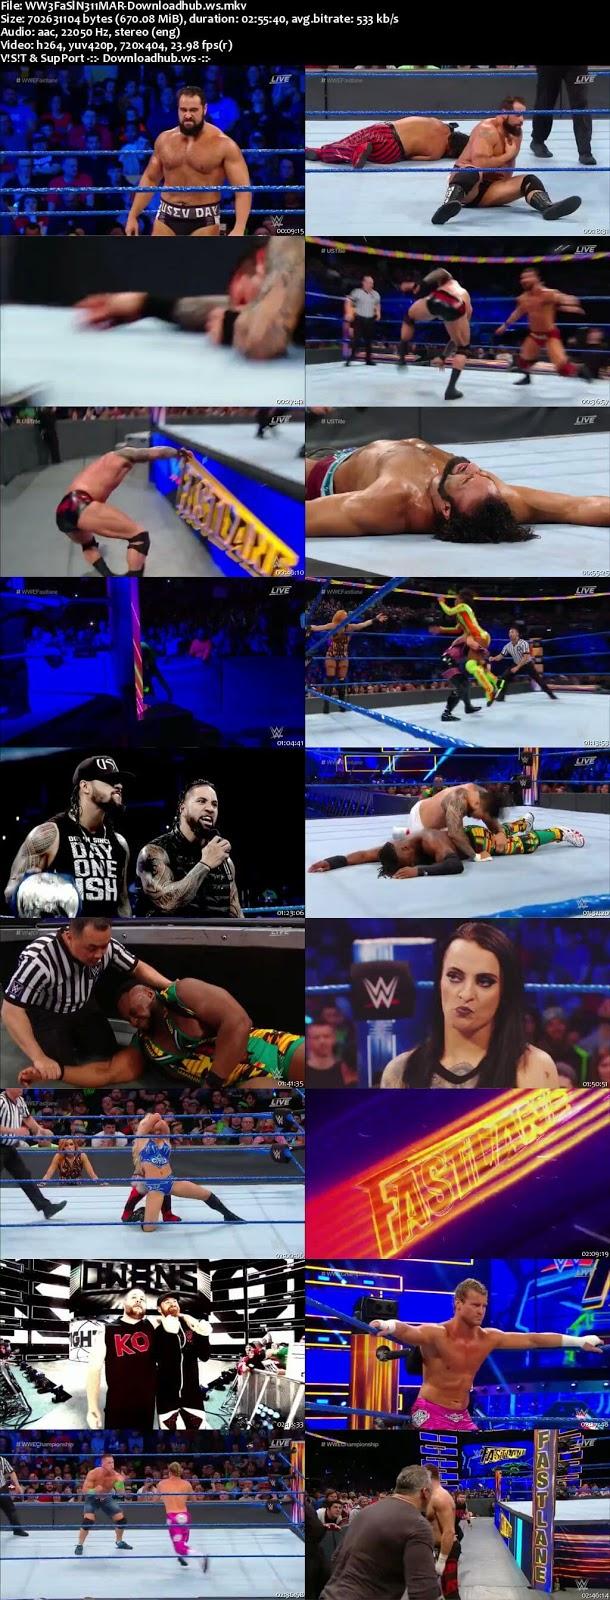 WWE Fastlane 11 March 2018 480p WEBRip Download